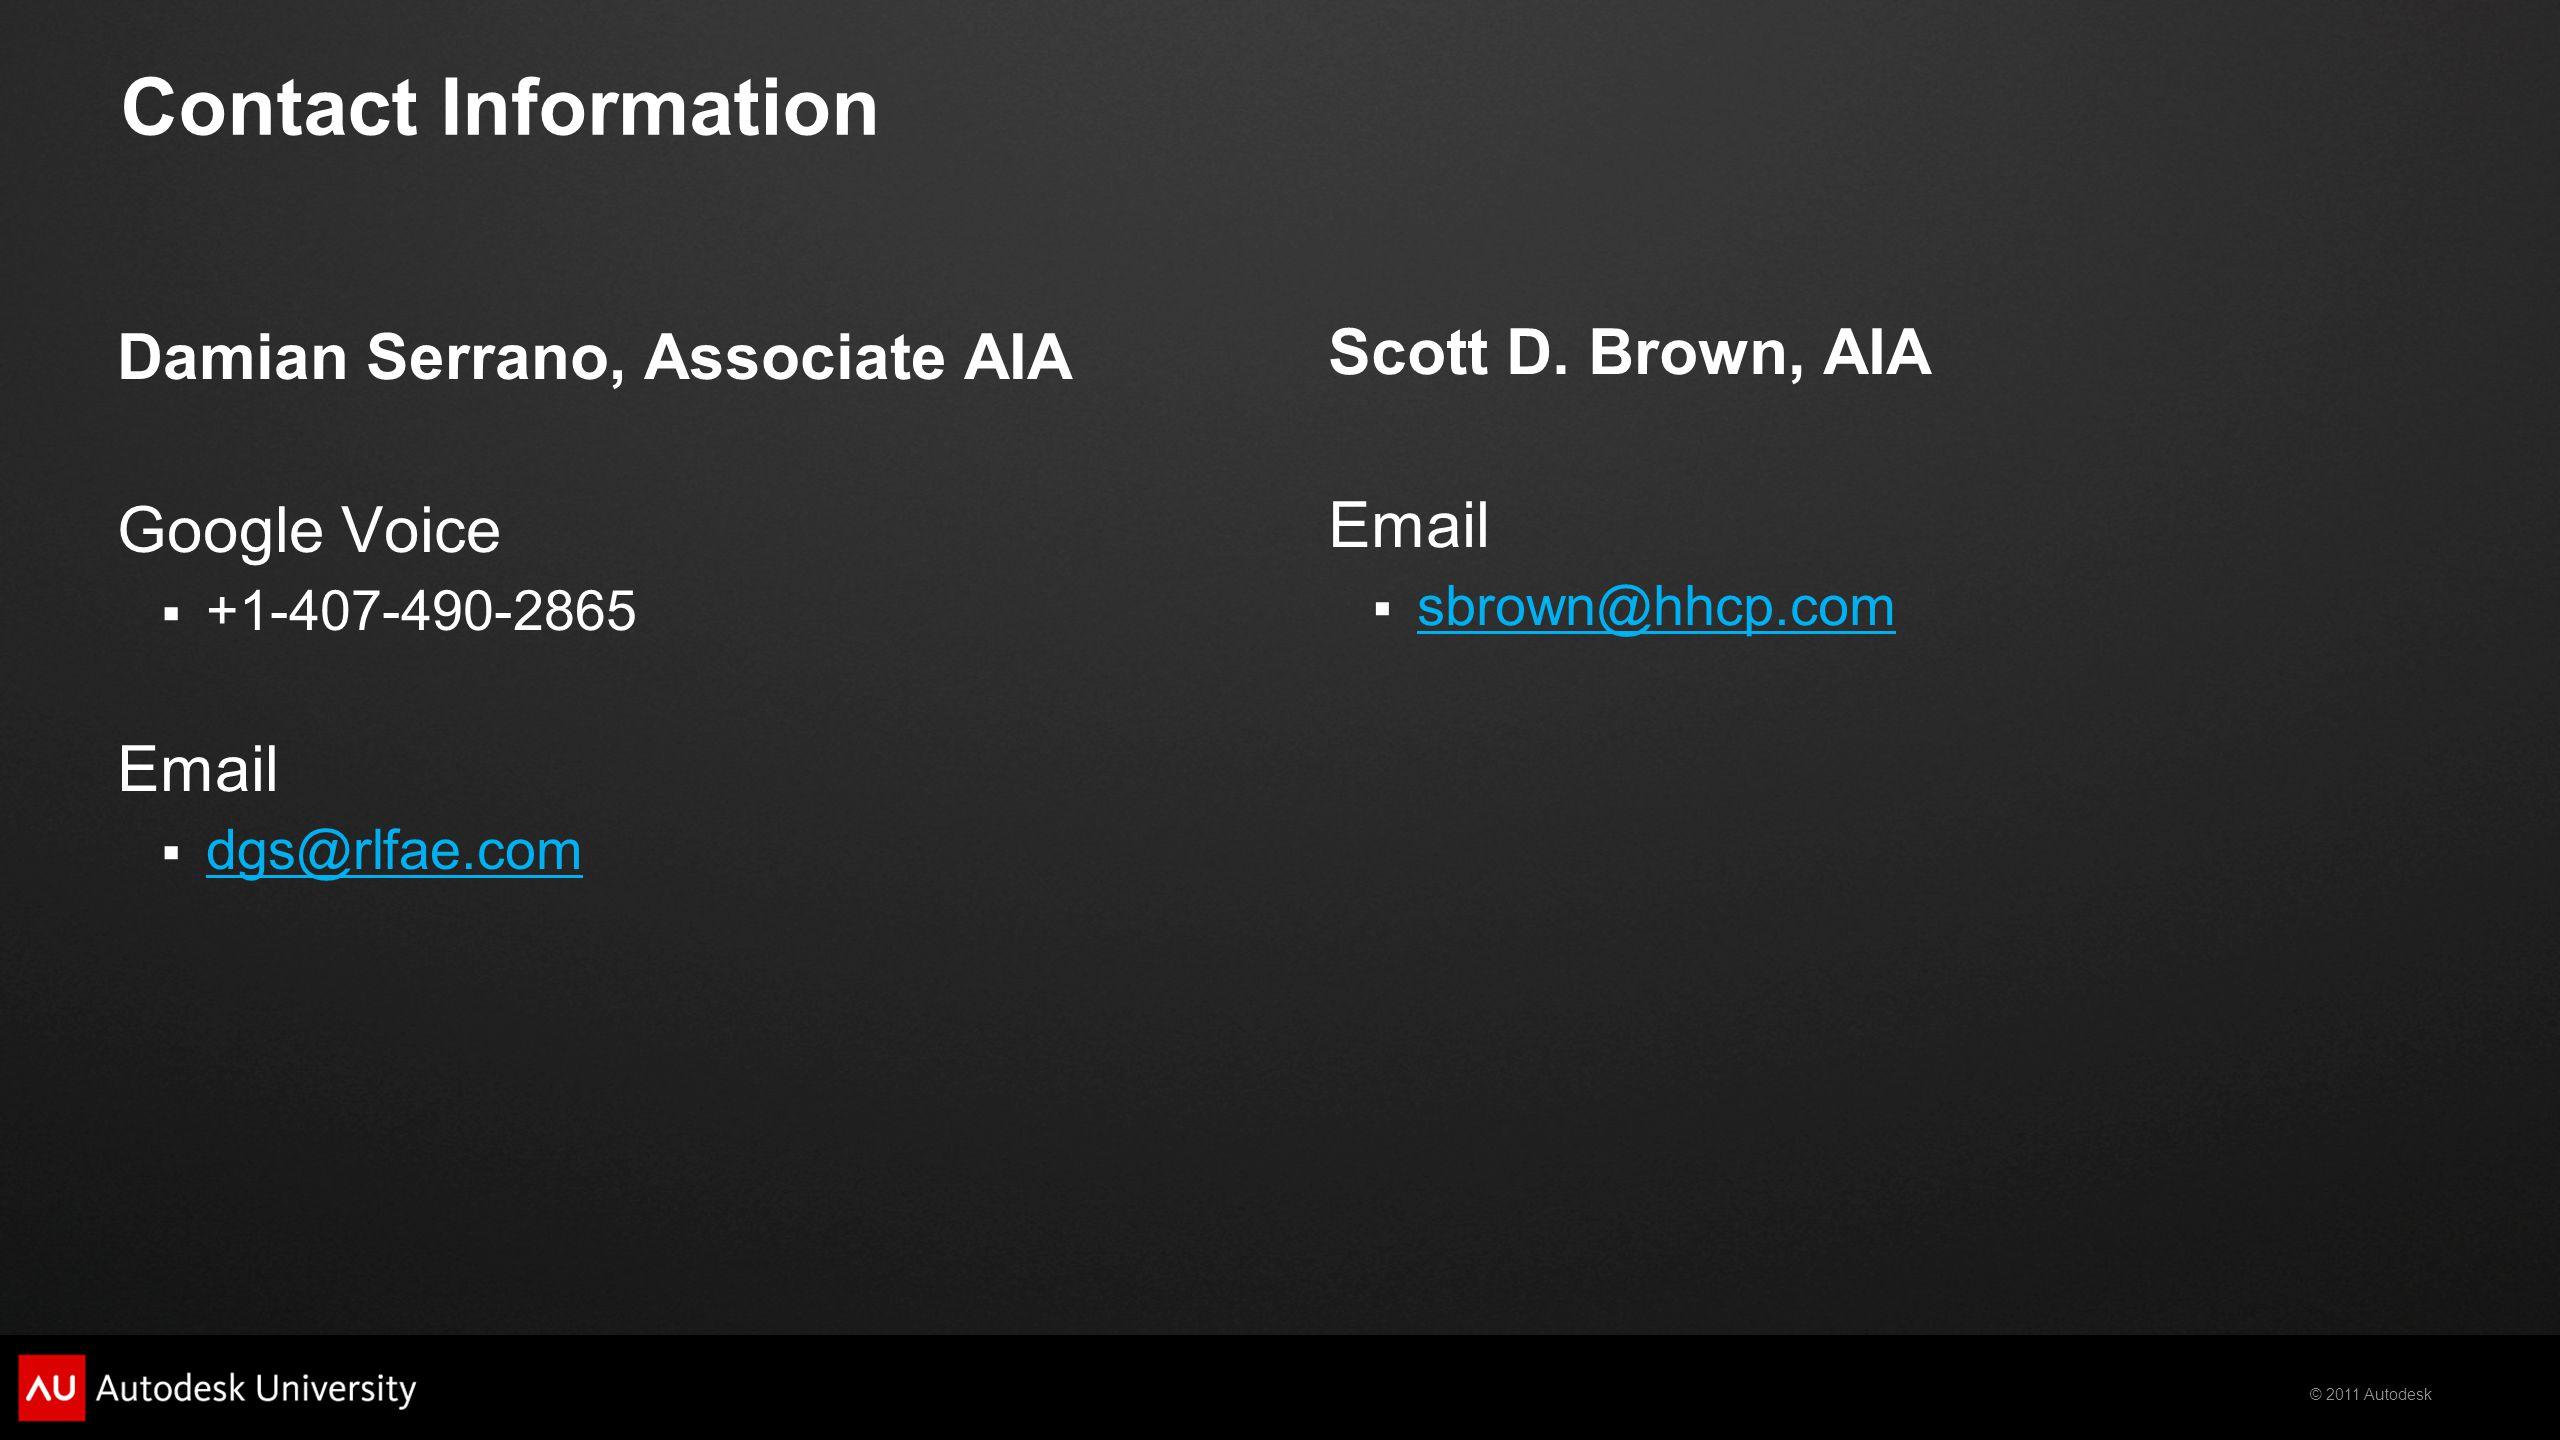 © 2011 Autodesk Contact Information Damian Serrano, Associate AIA Google Voice  +1-407-490-2865 Email  dgs@rlfae.com dgs@rlfae.com Scott D.